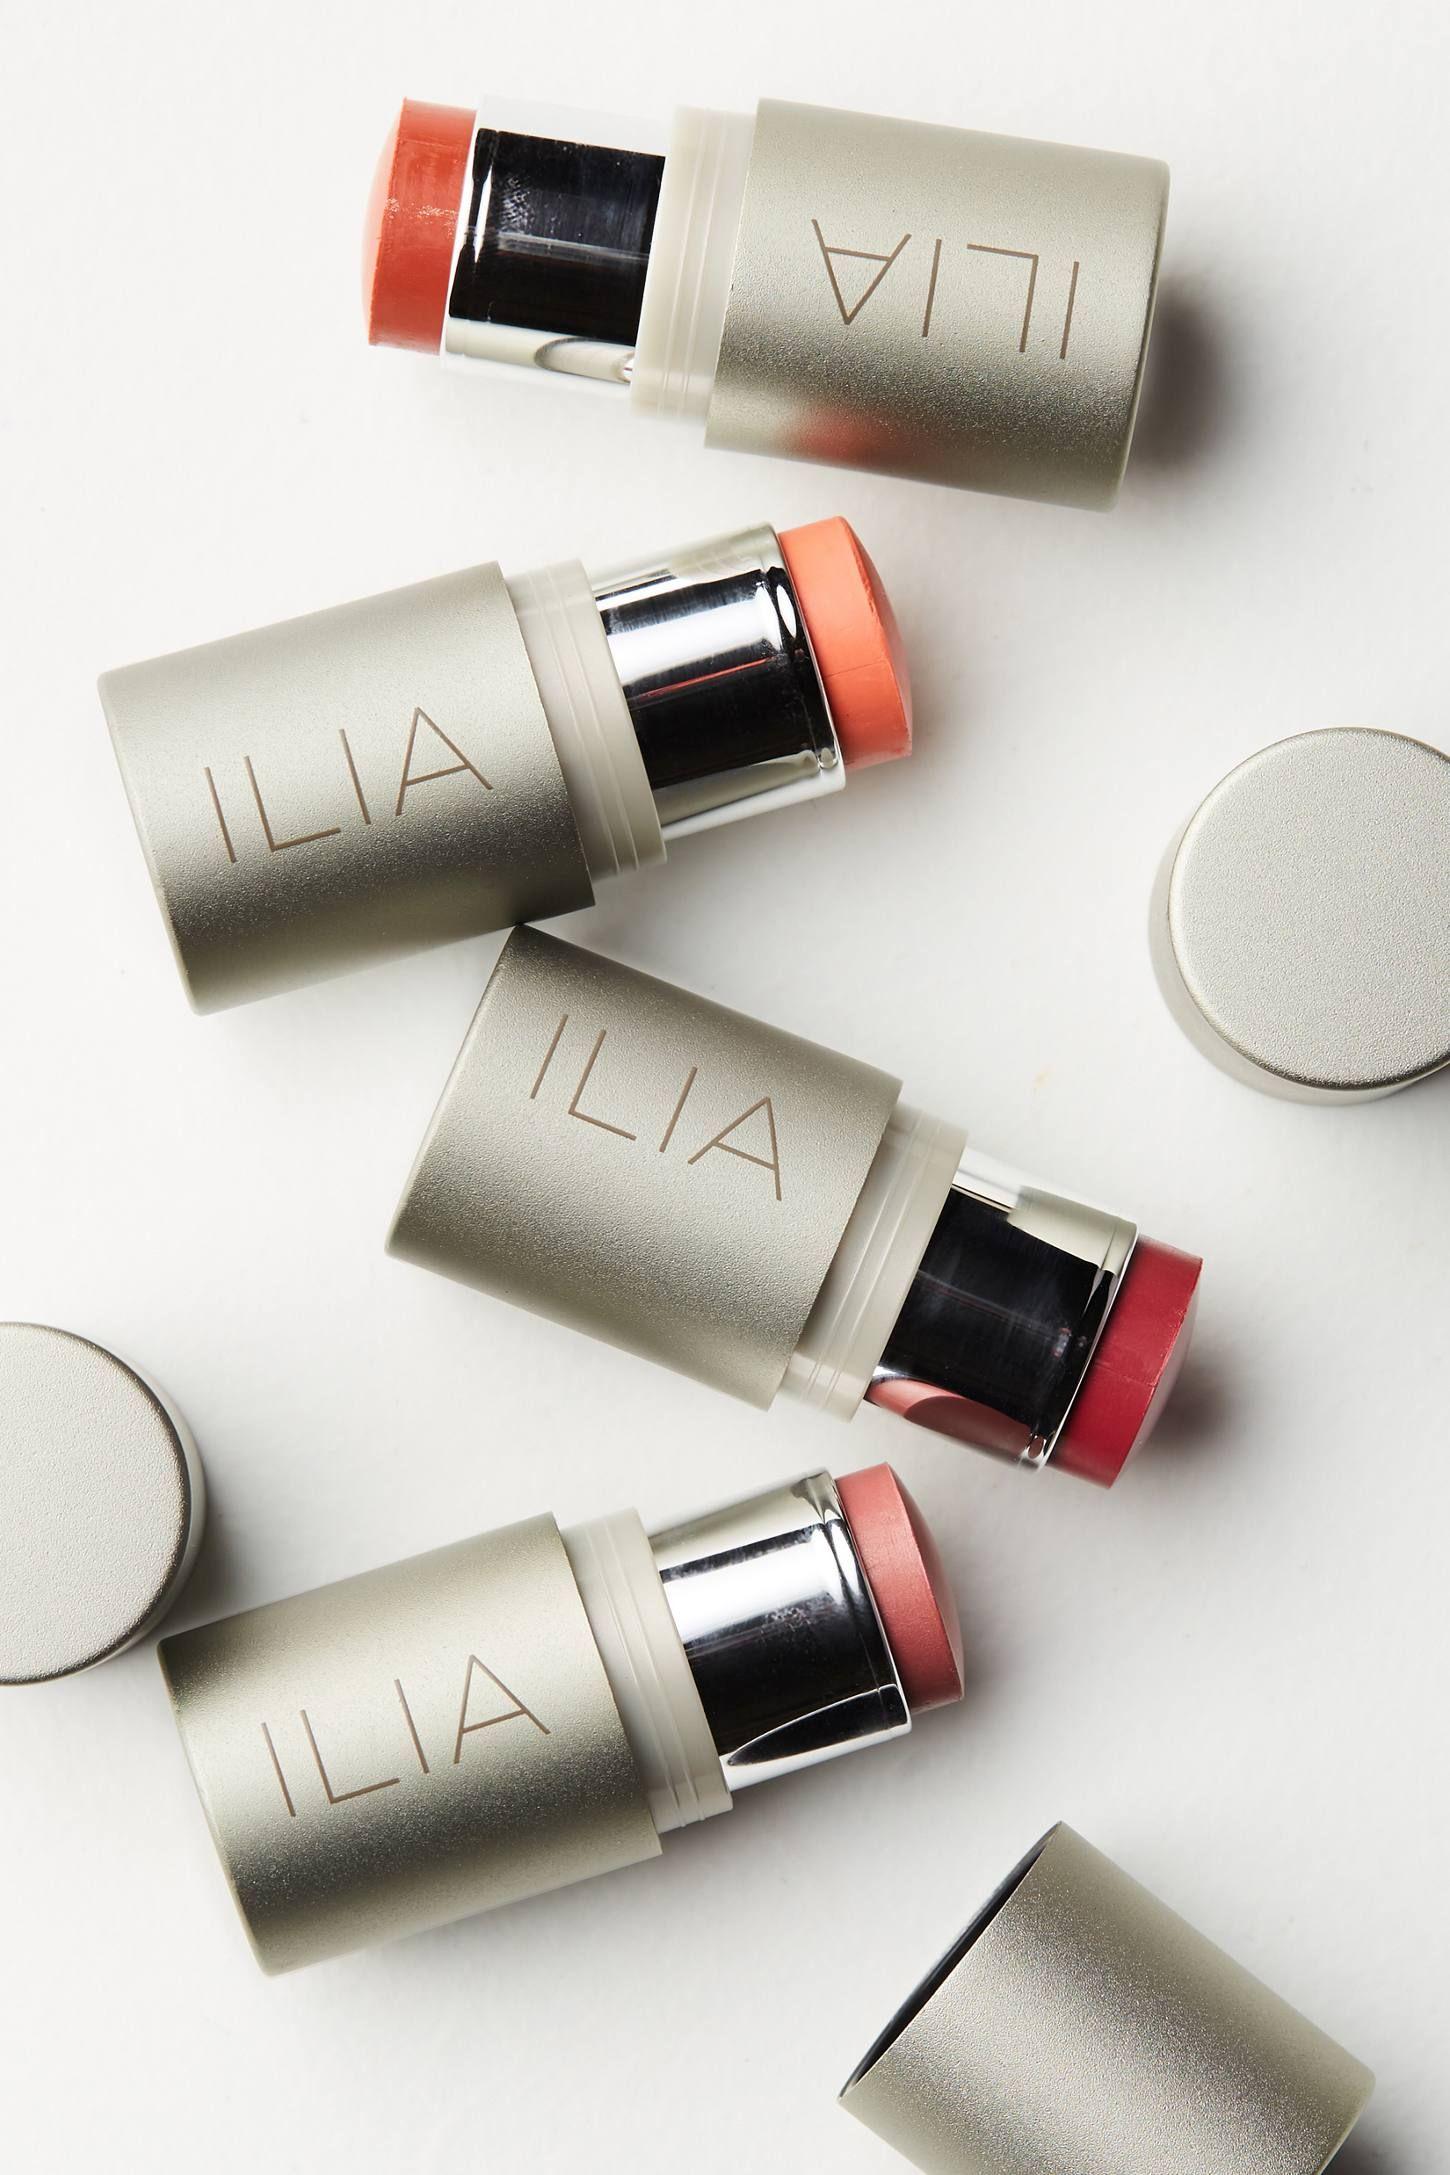 Ilia Multi Stick in 2019 Beauty, Beauty care, Natural